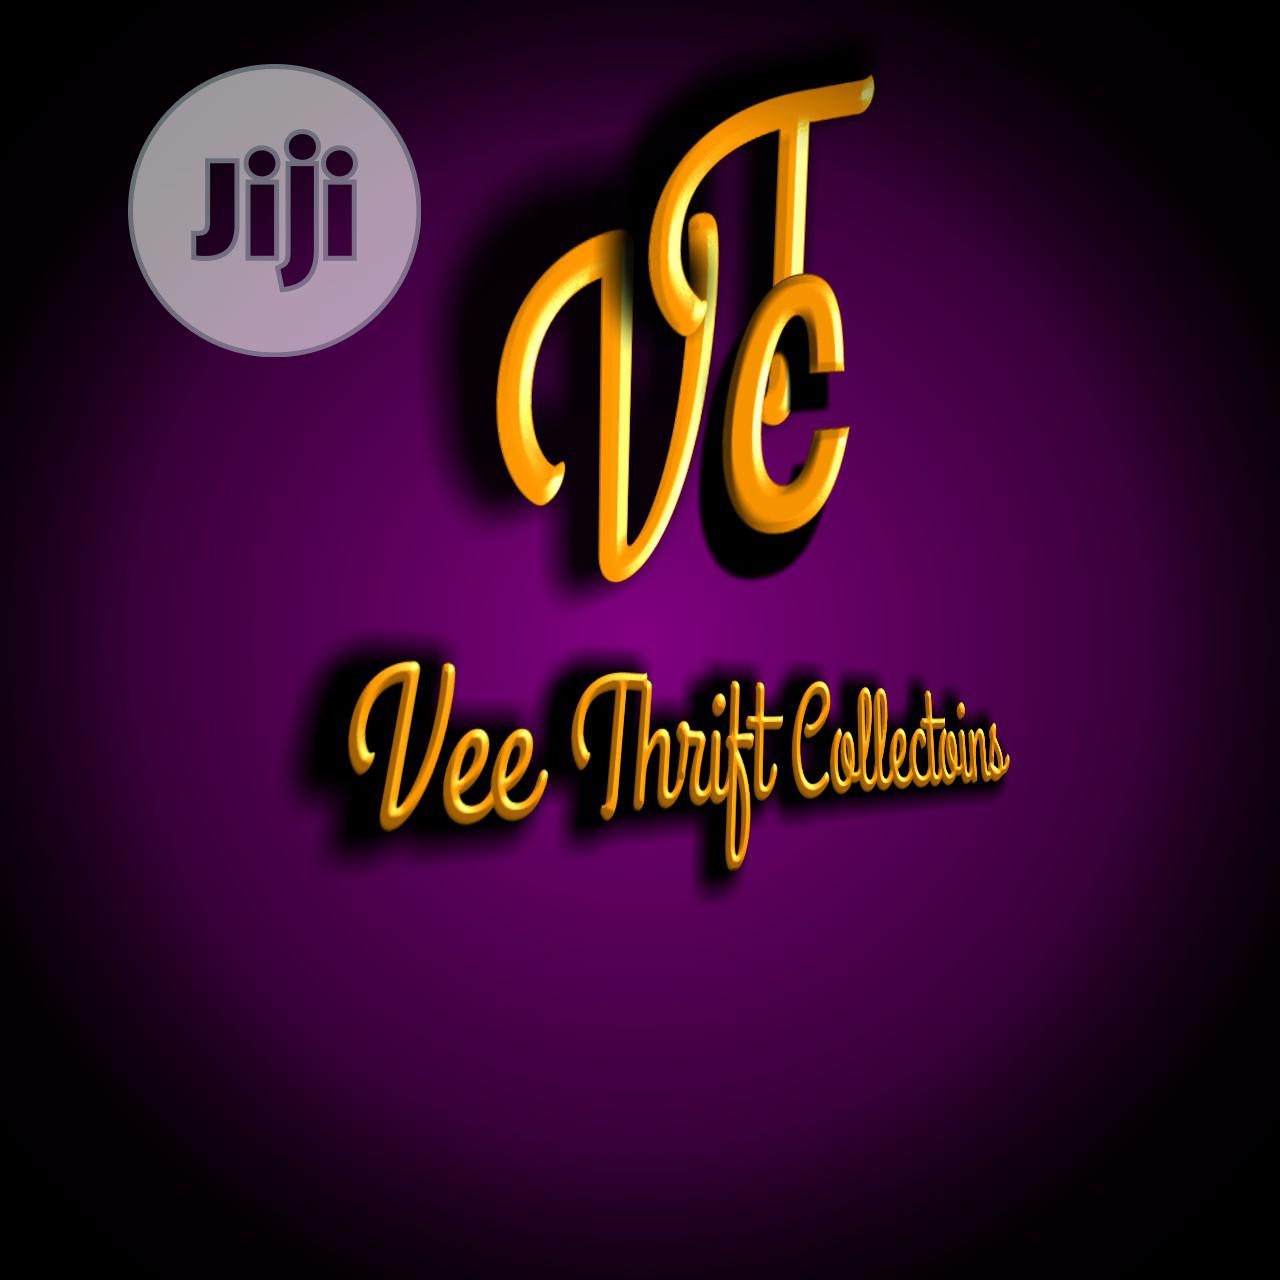 Archive: Channel Video Editor, Logo, Channel Banner/Art Maker